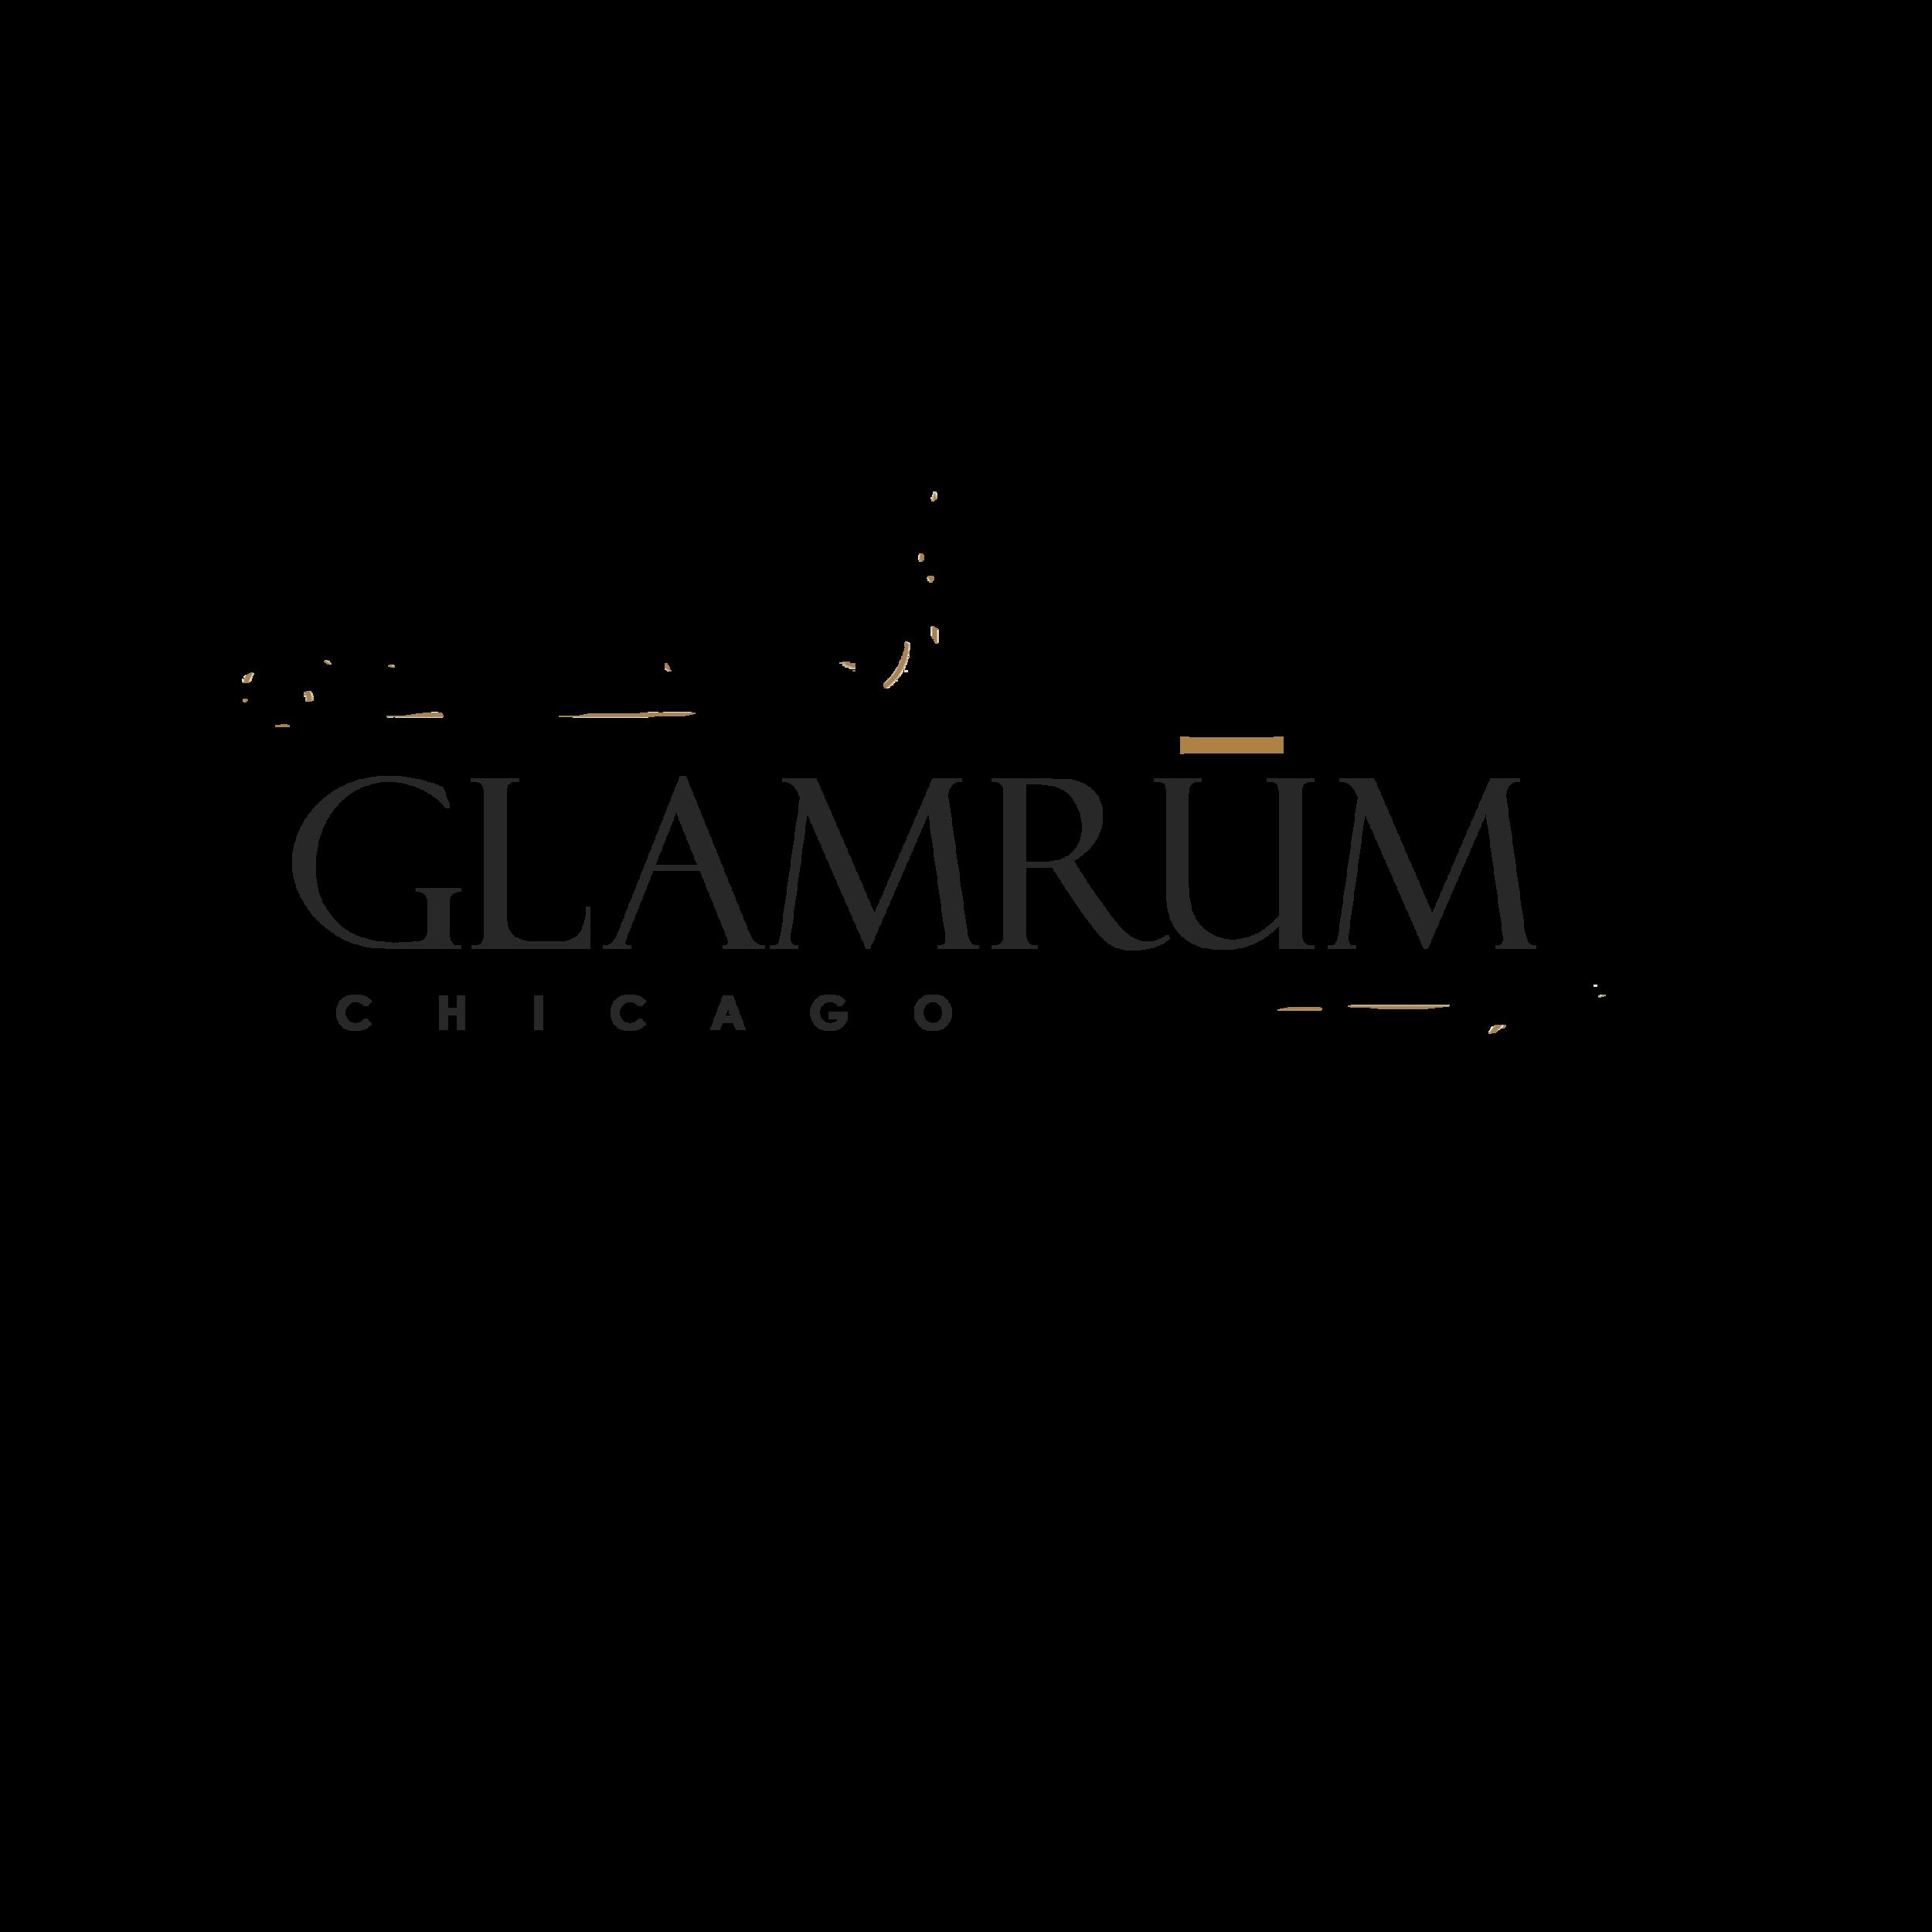 glamrum-.png